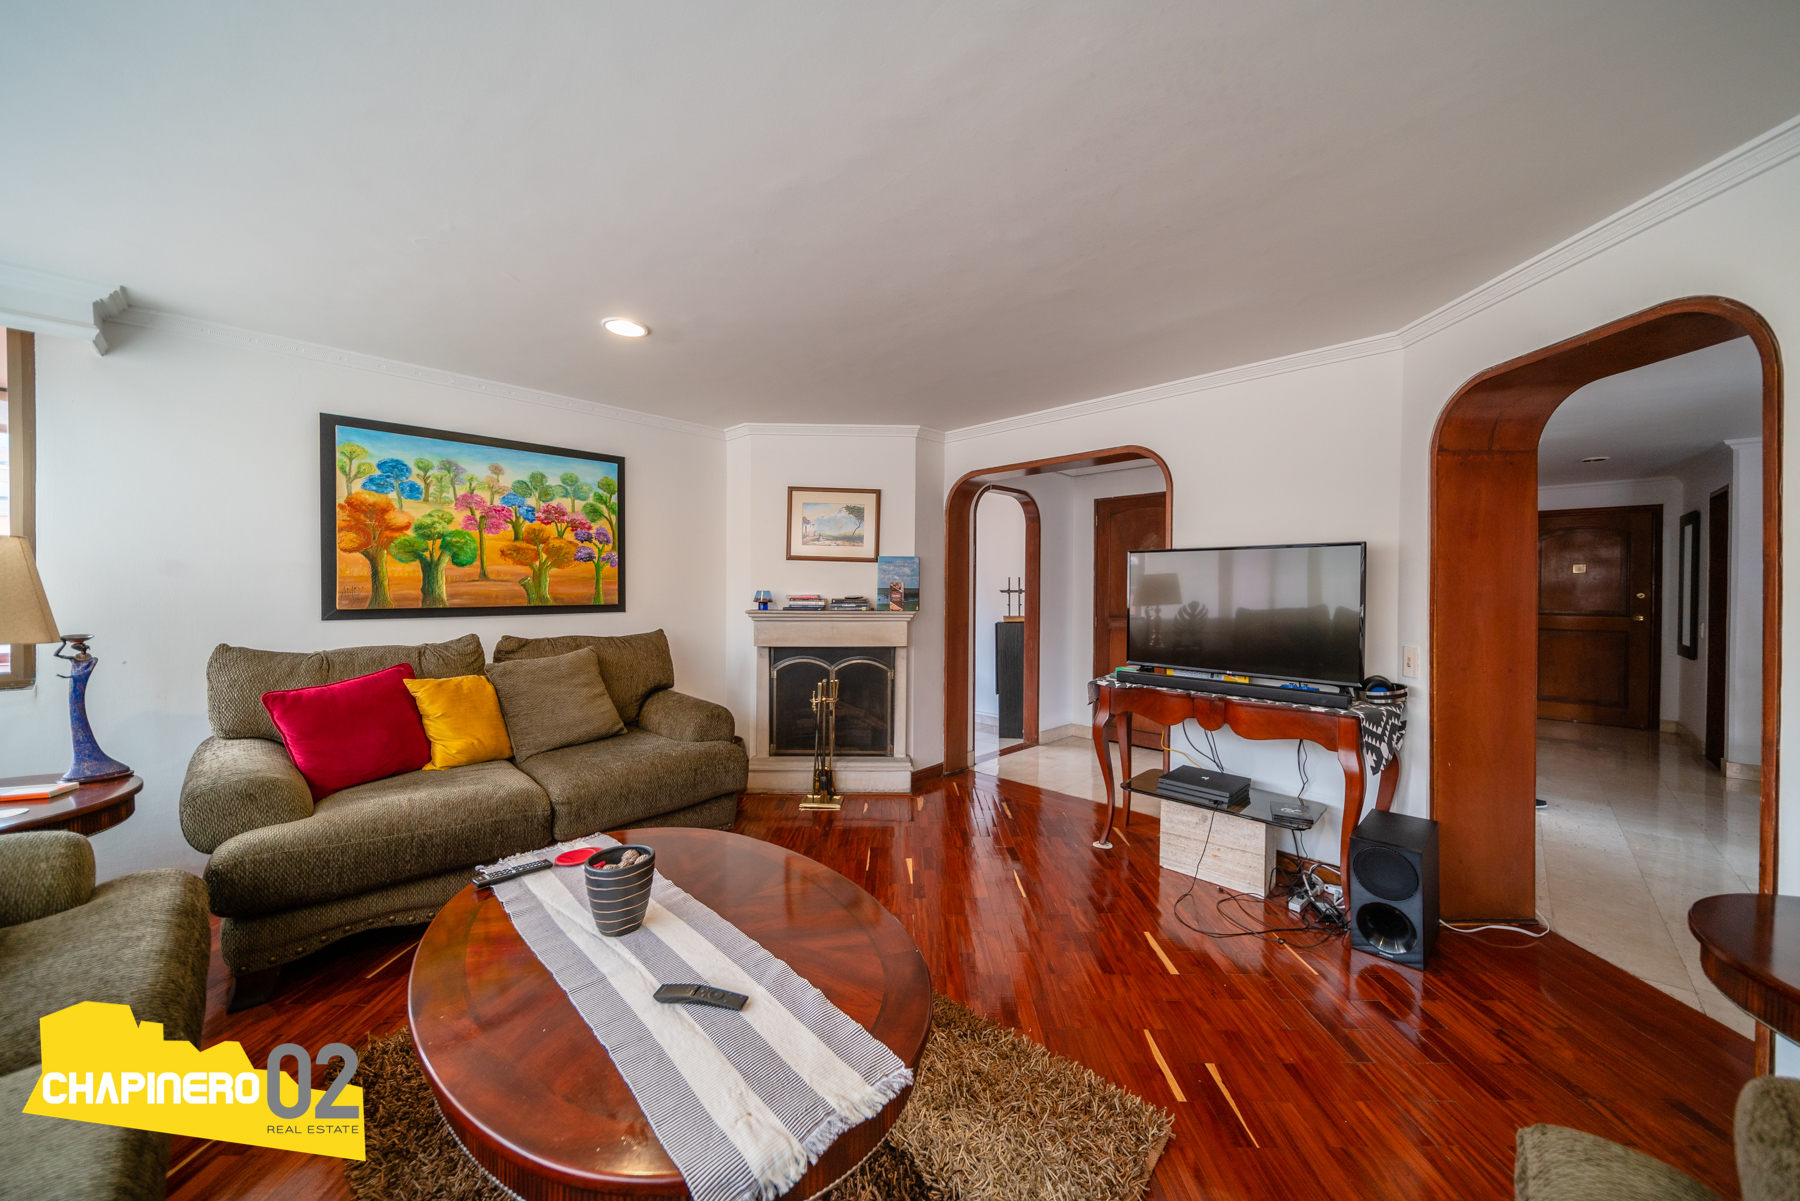 PH Venta :: 216 m² :: Chicó Norte 2 :: $1.500 M